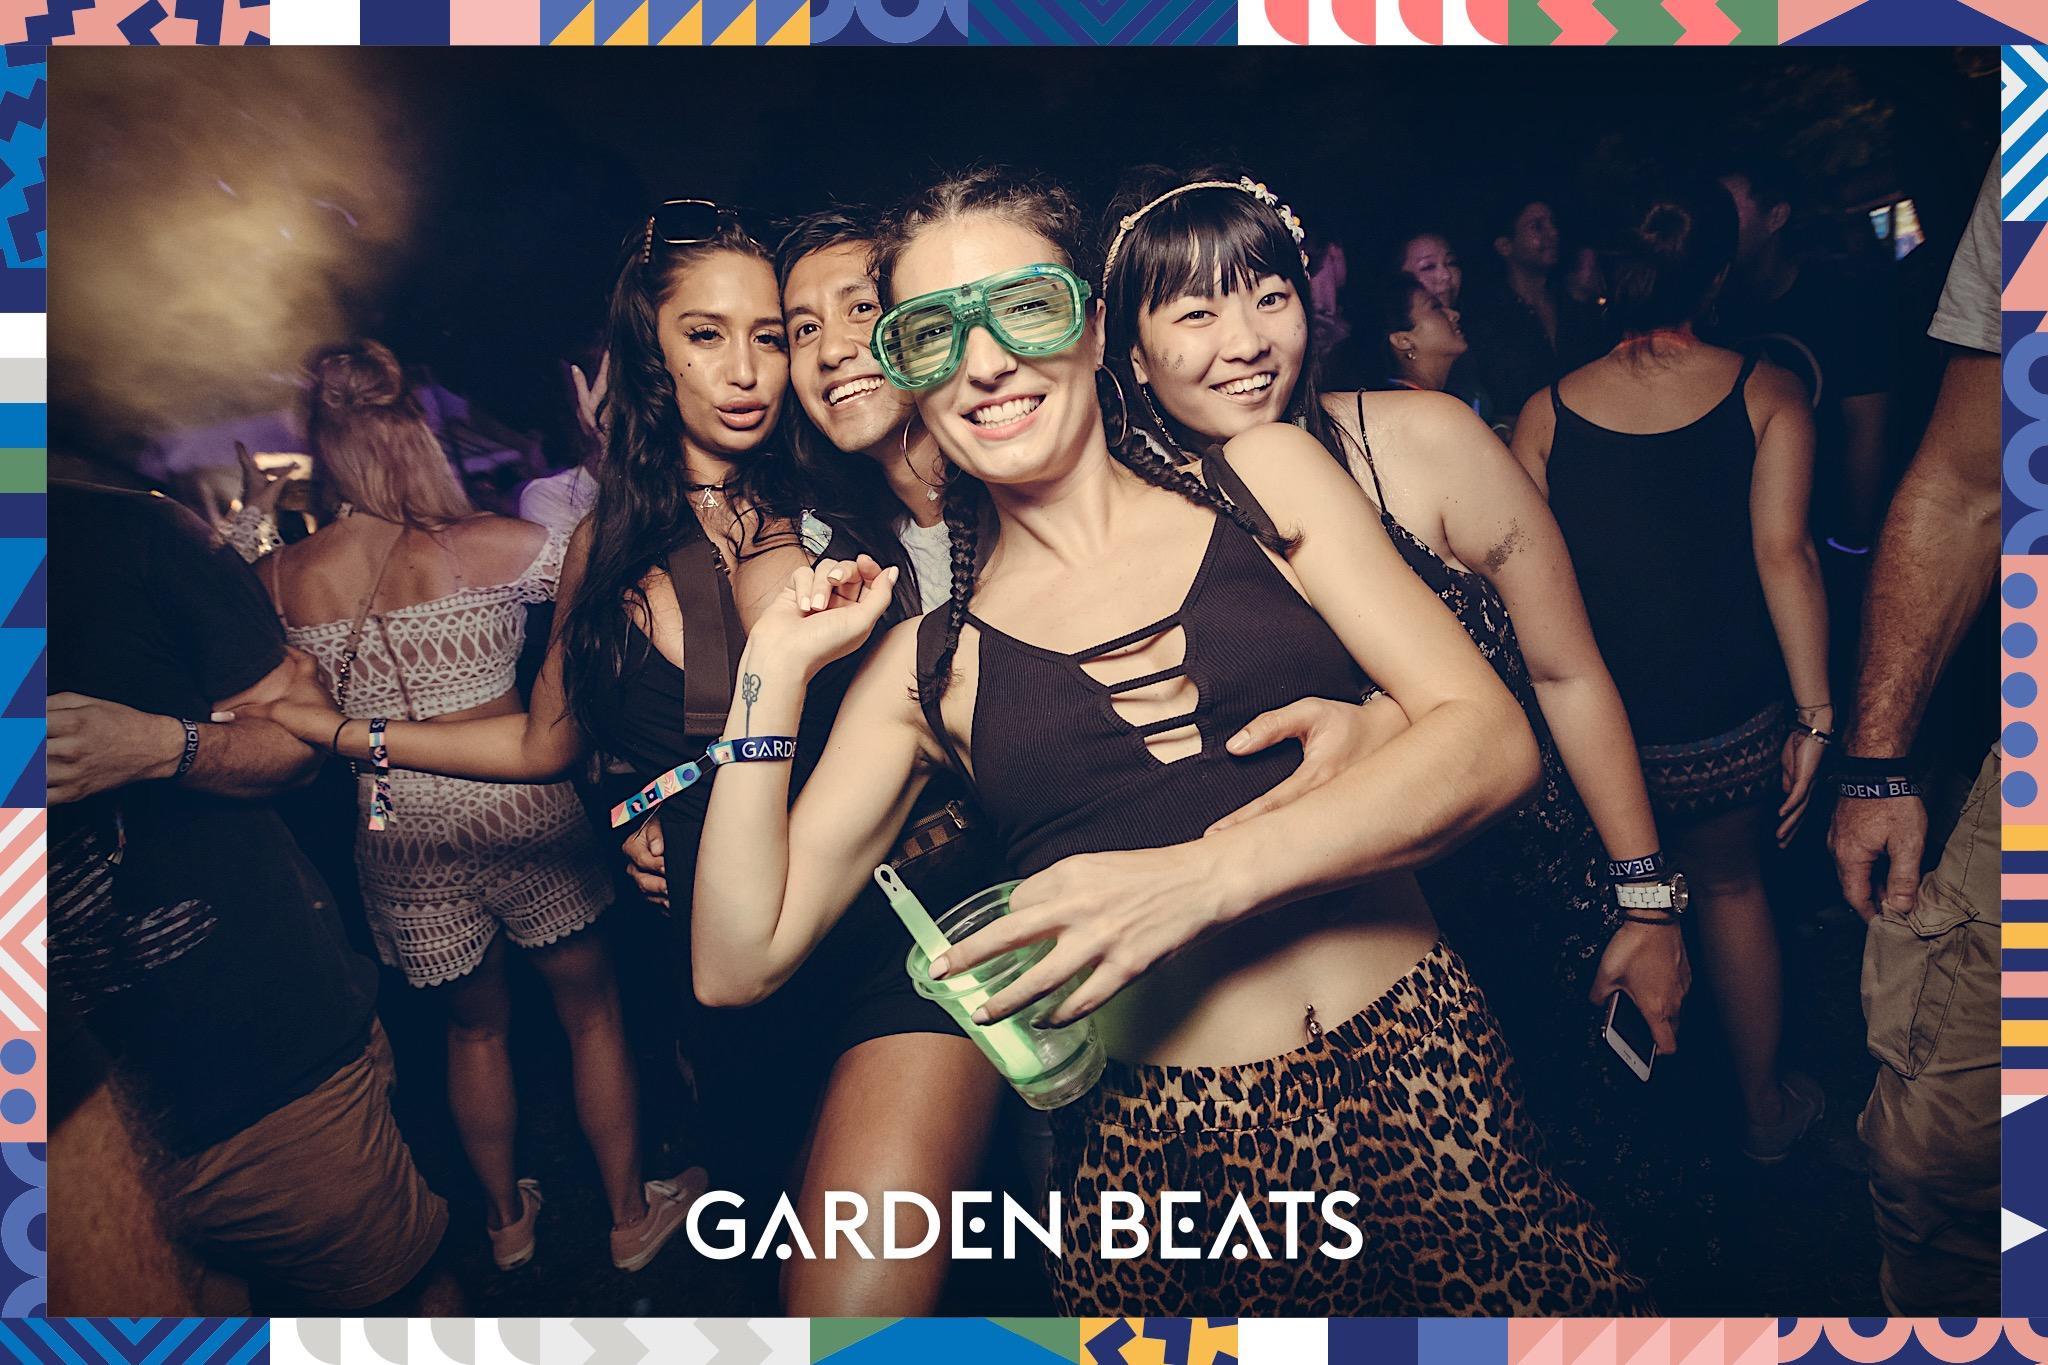 03032018_GardenBeats_Colossal886_Watermarked.jpg